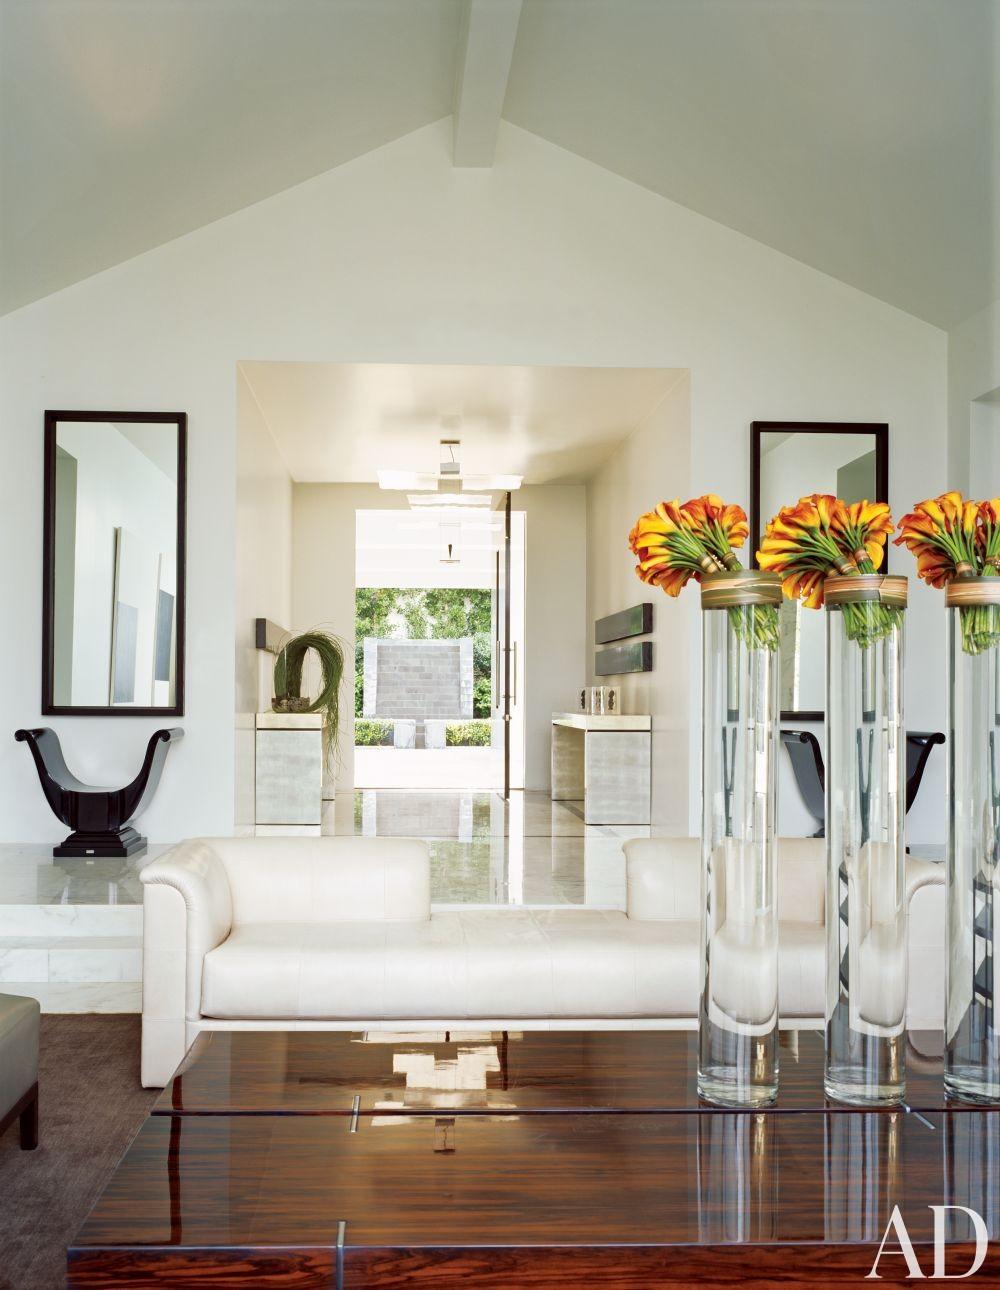 Jennifer Post Design Design Room By Room Inc Https Www Pinterest Com Pin